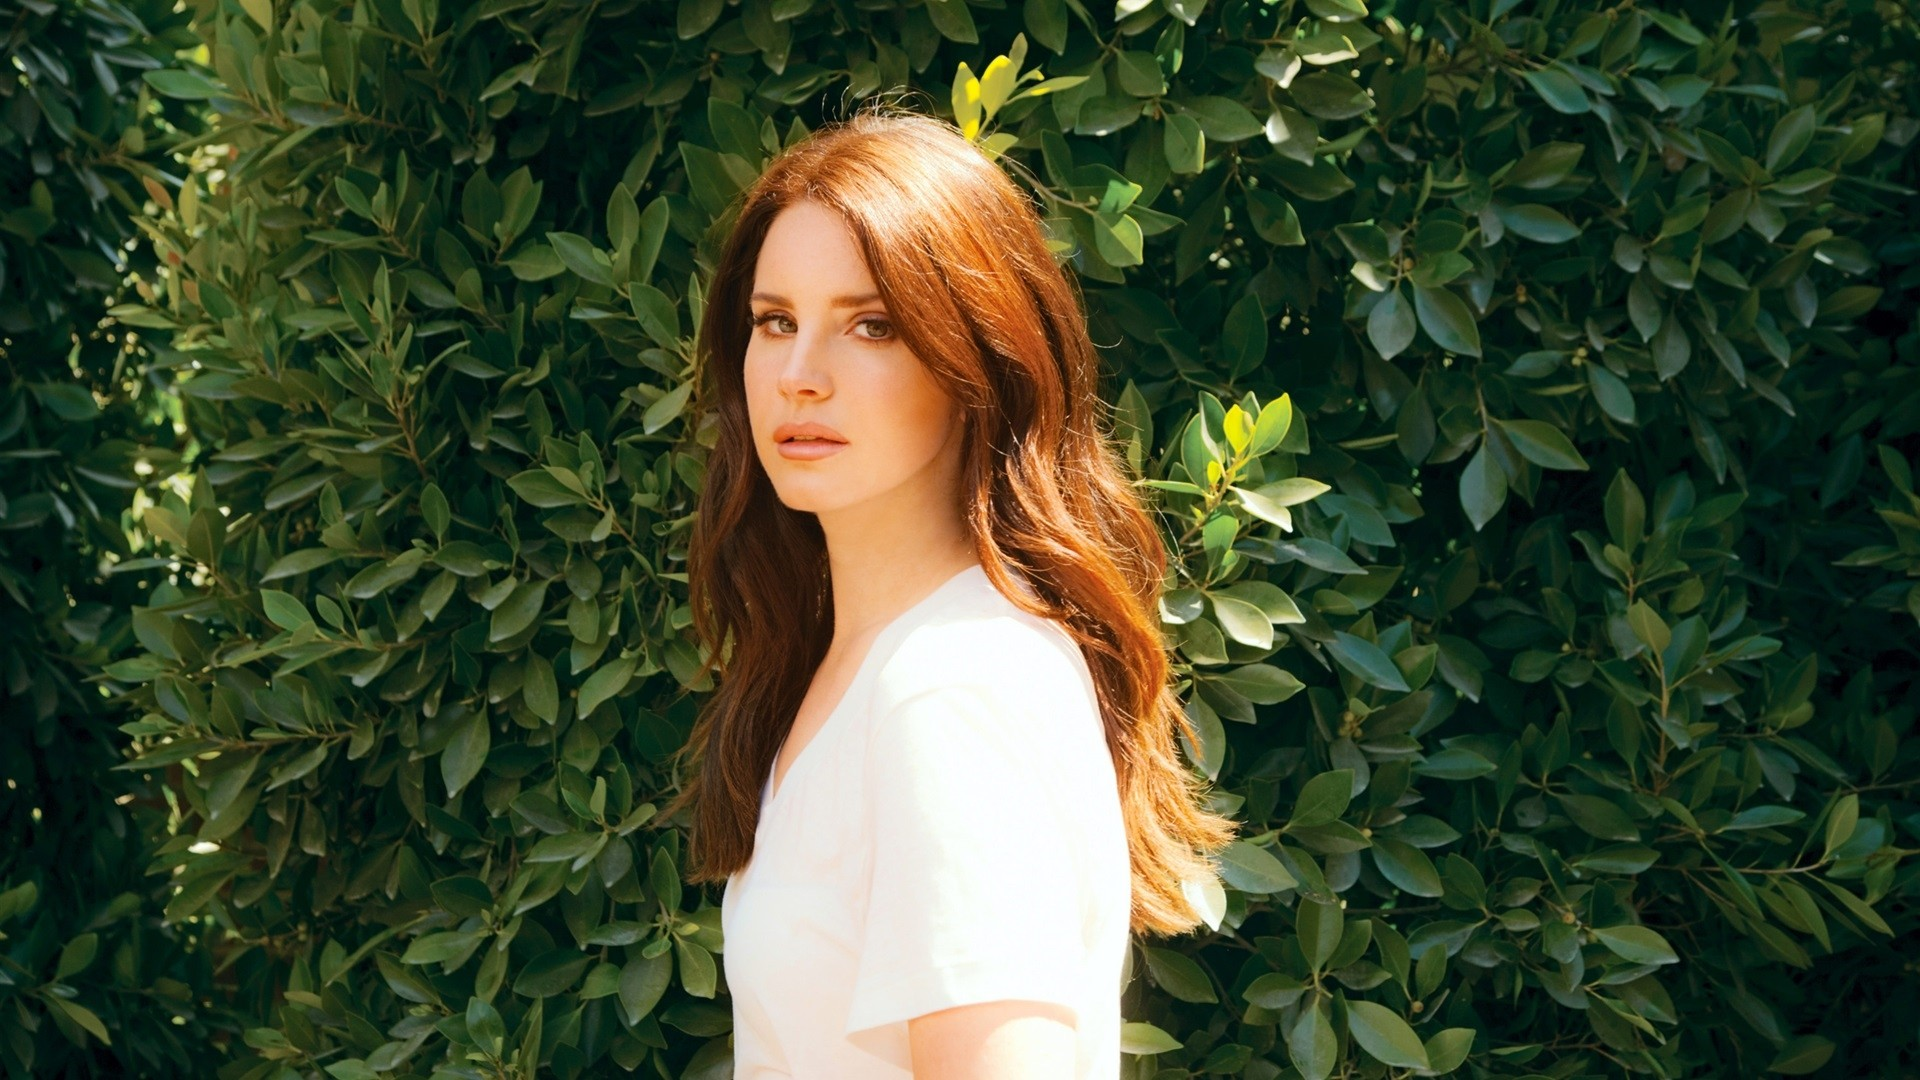 Lana Del Rey wallpaper photo hd